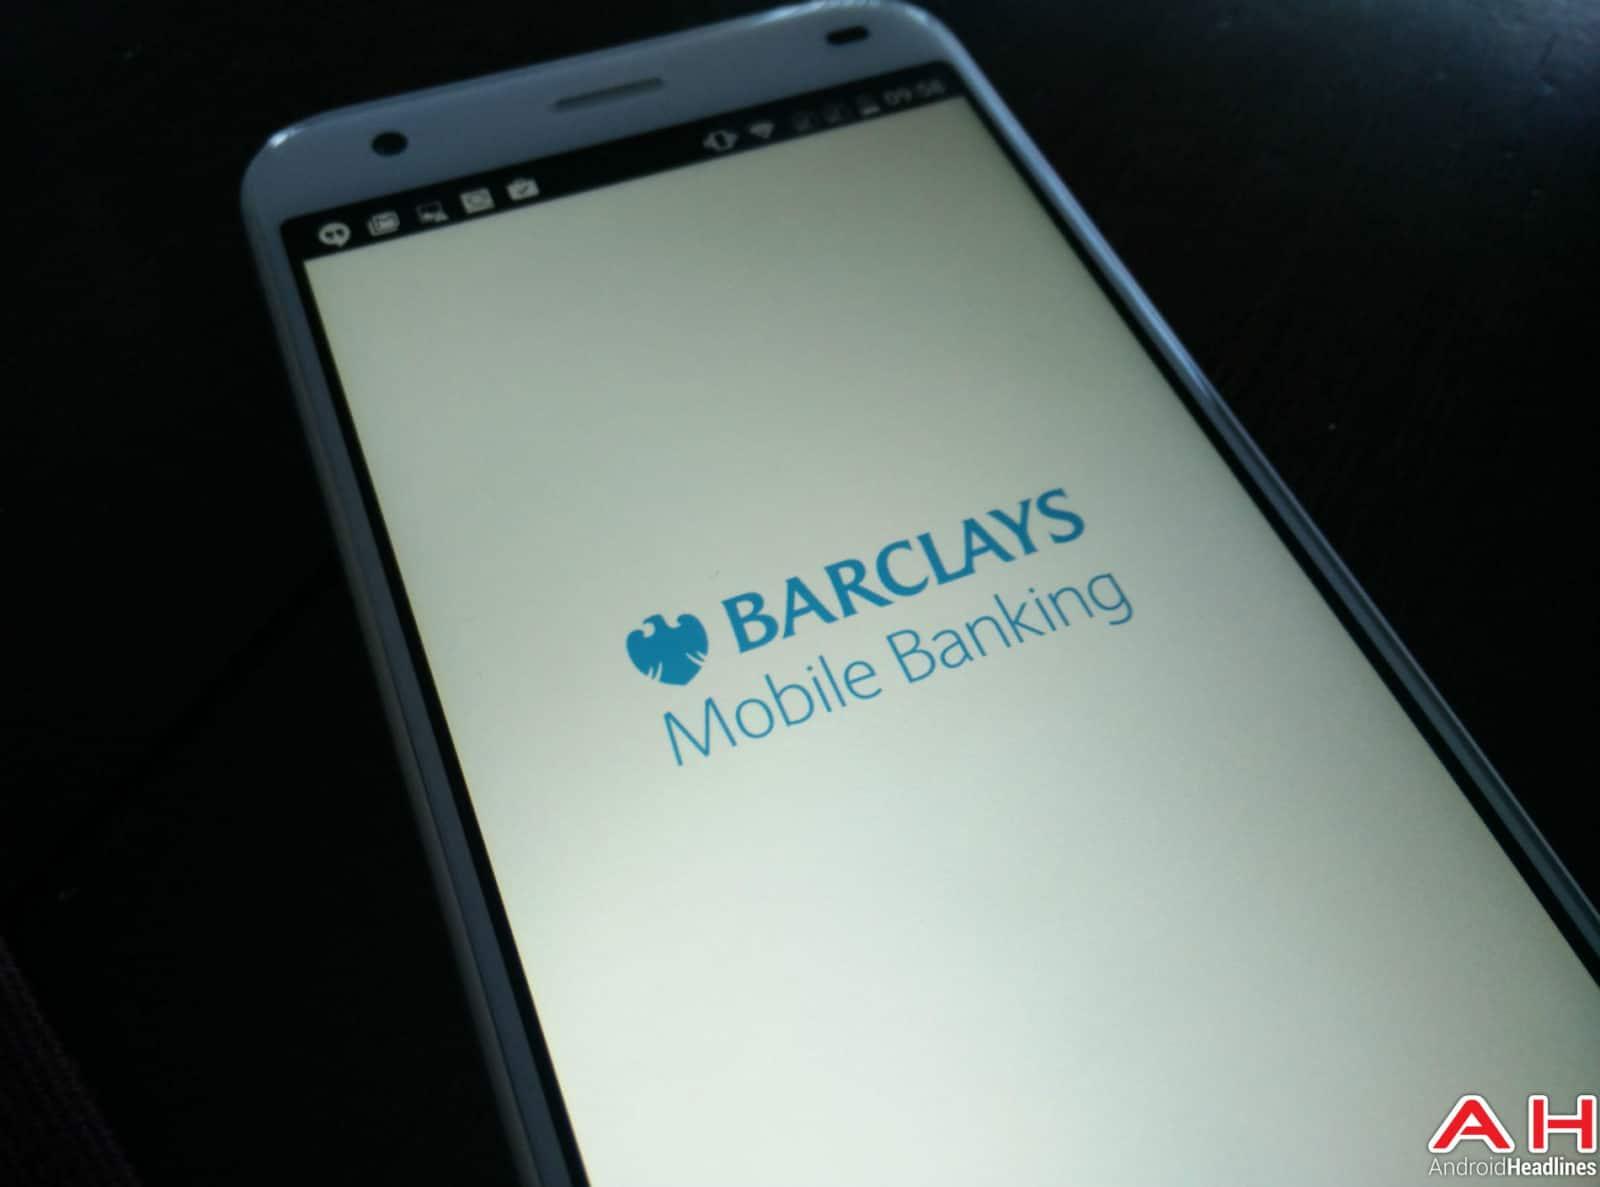 Barclays AH